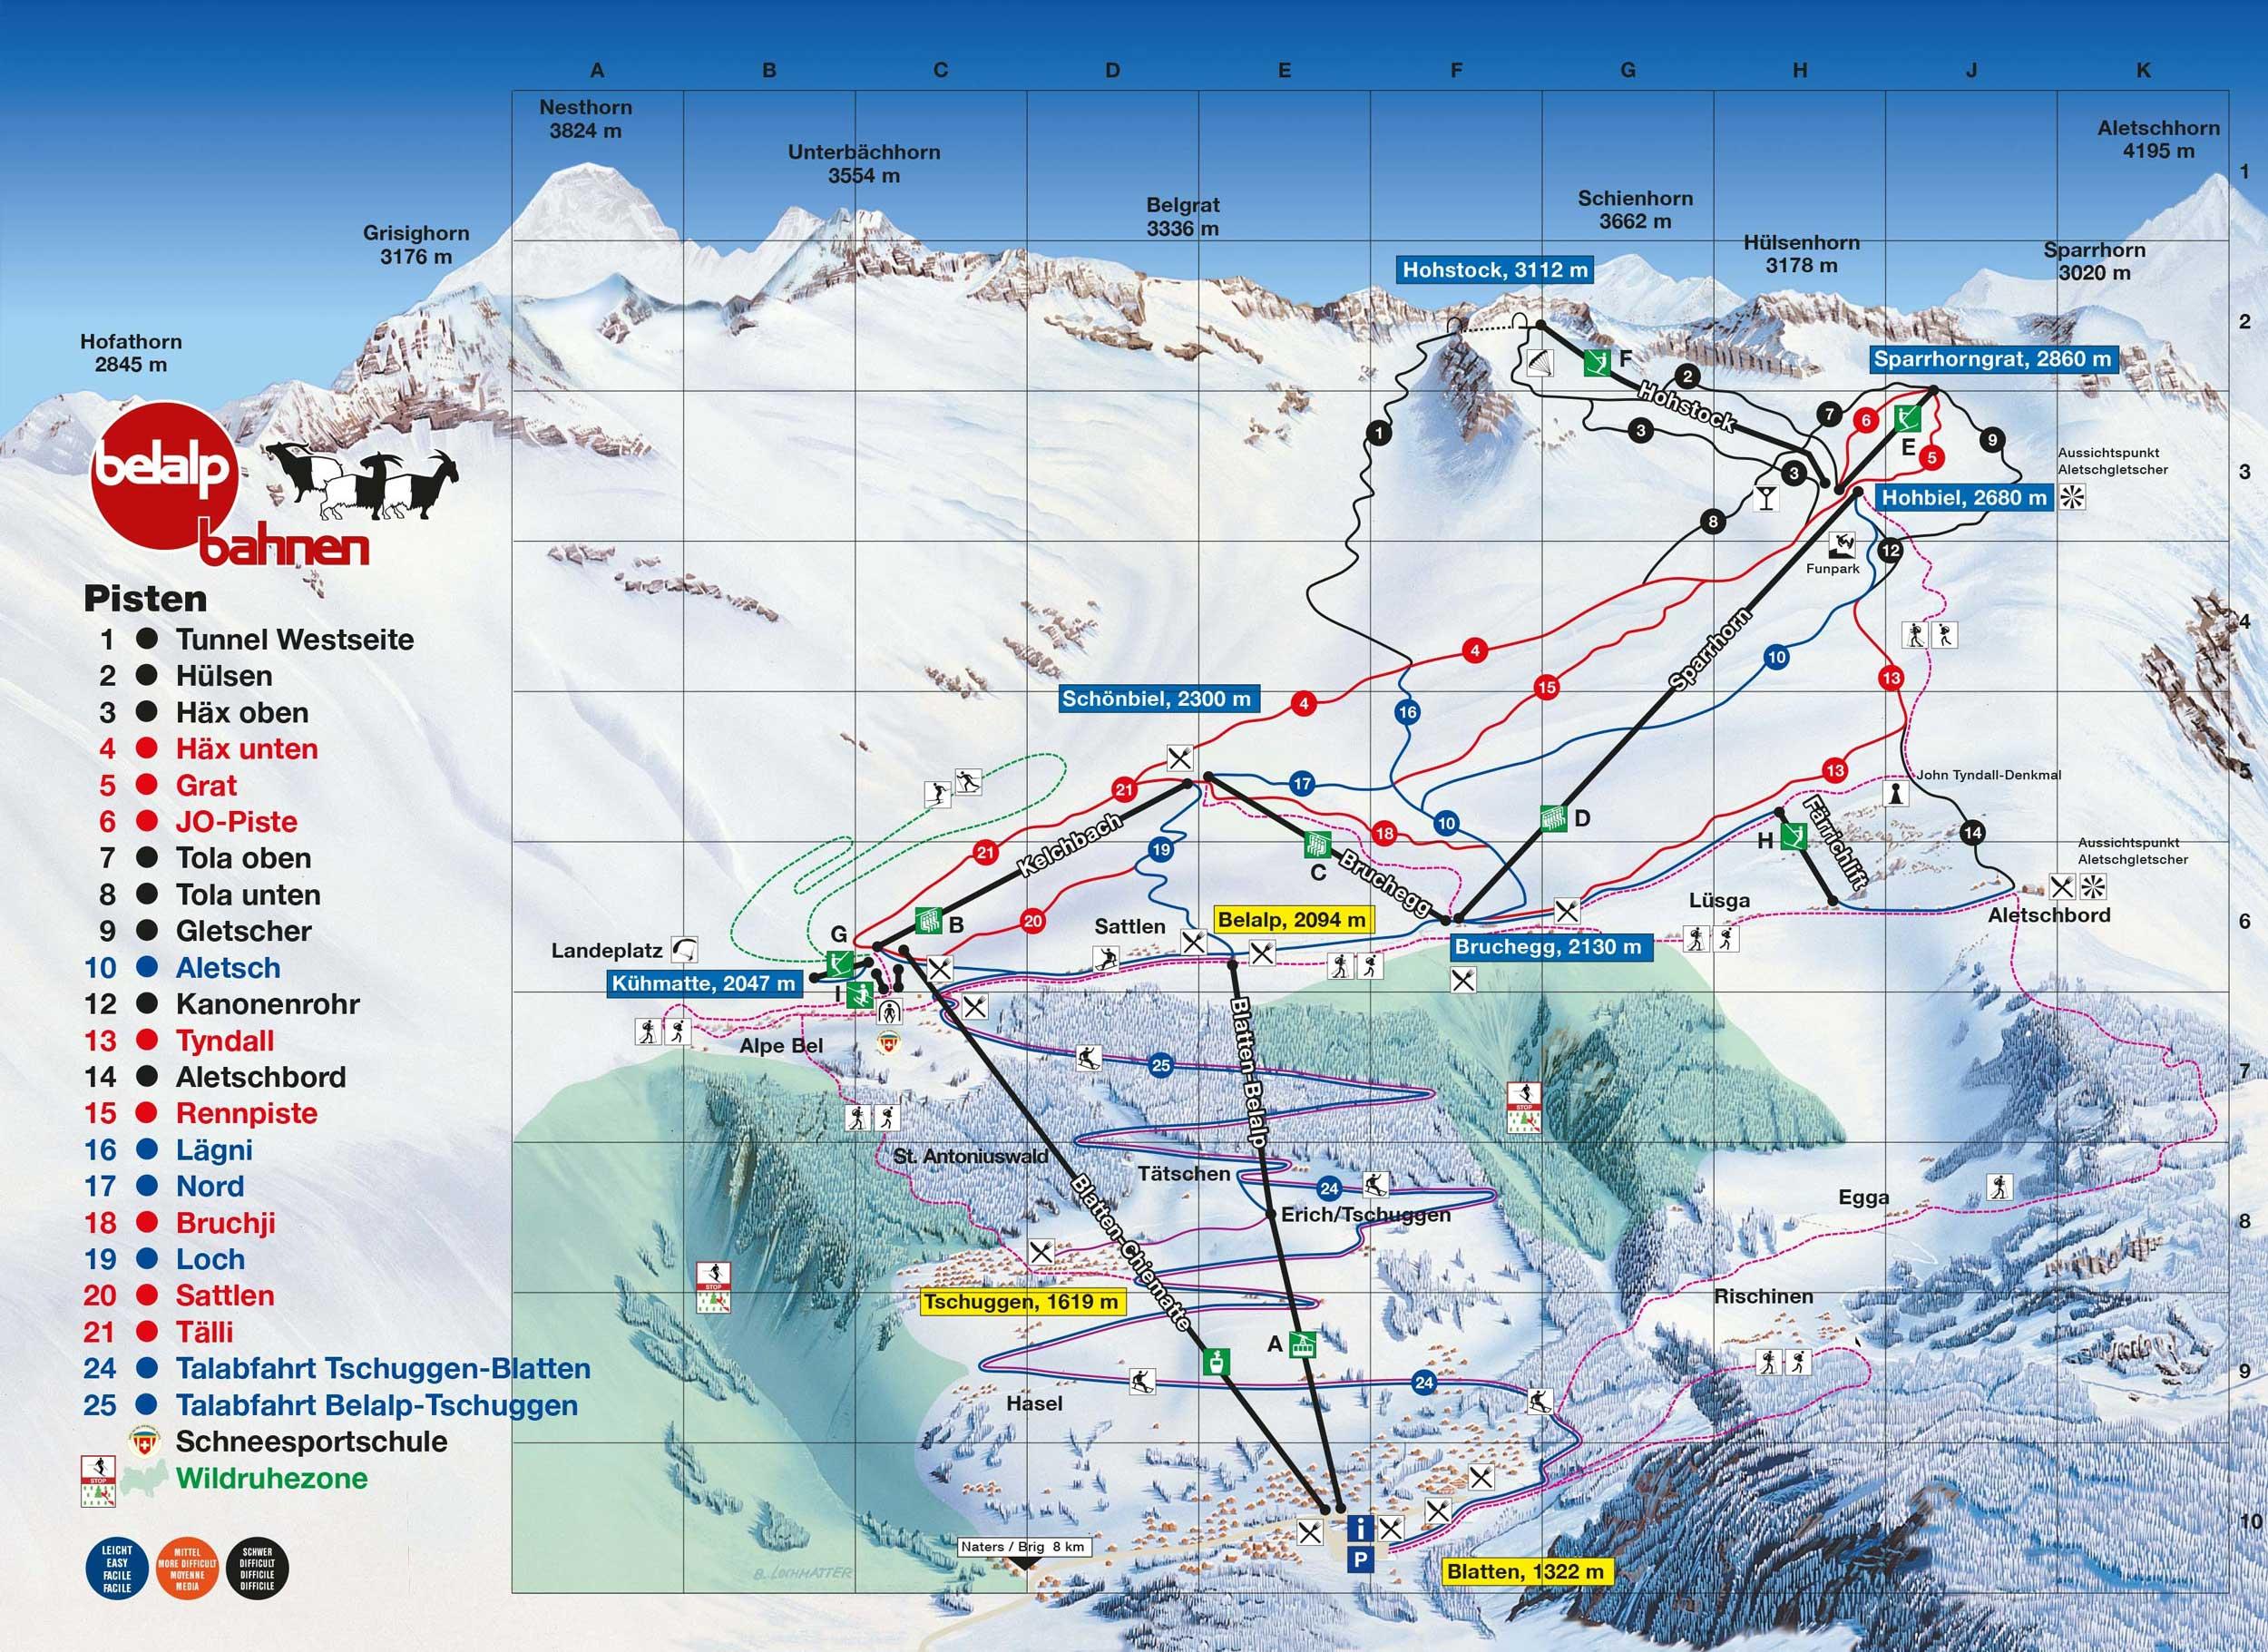 Ski map Belalp (Switzerland) Ski Switzerland Map on the maldives map, budapest map, isle of man map, berlin map, malta map, denmark map, portugal map, slovakia map, austria map, lithuania map, geneva map, the usa map, tunisia map, hamburg map, swiss map, poland map, latvia map, prague map, snow map, cyprus map,